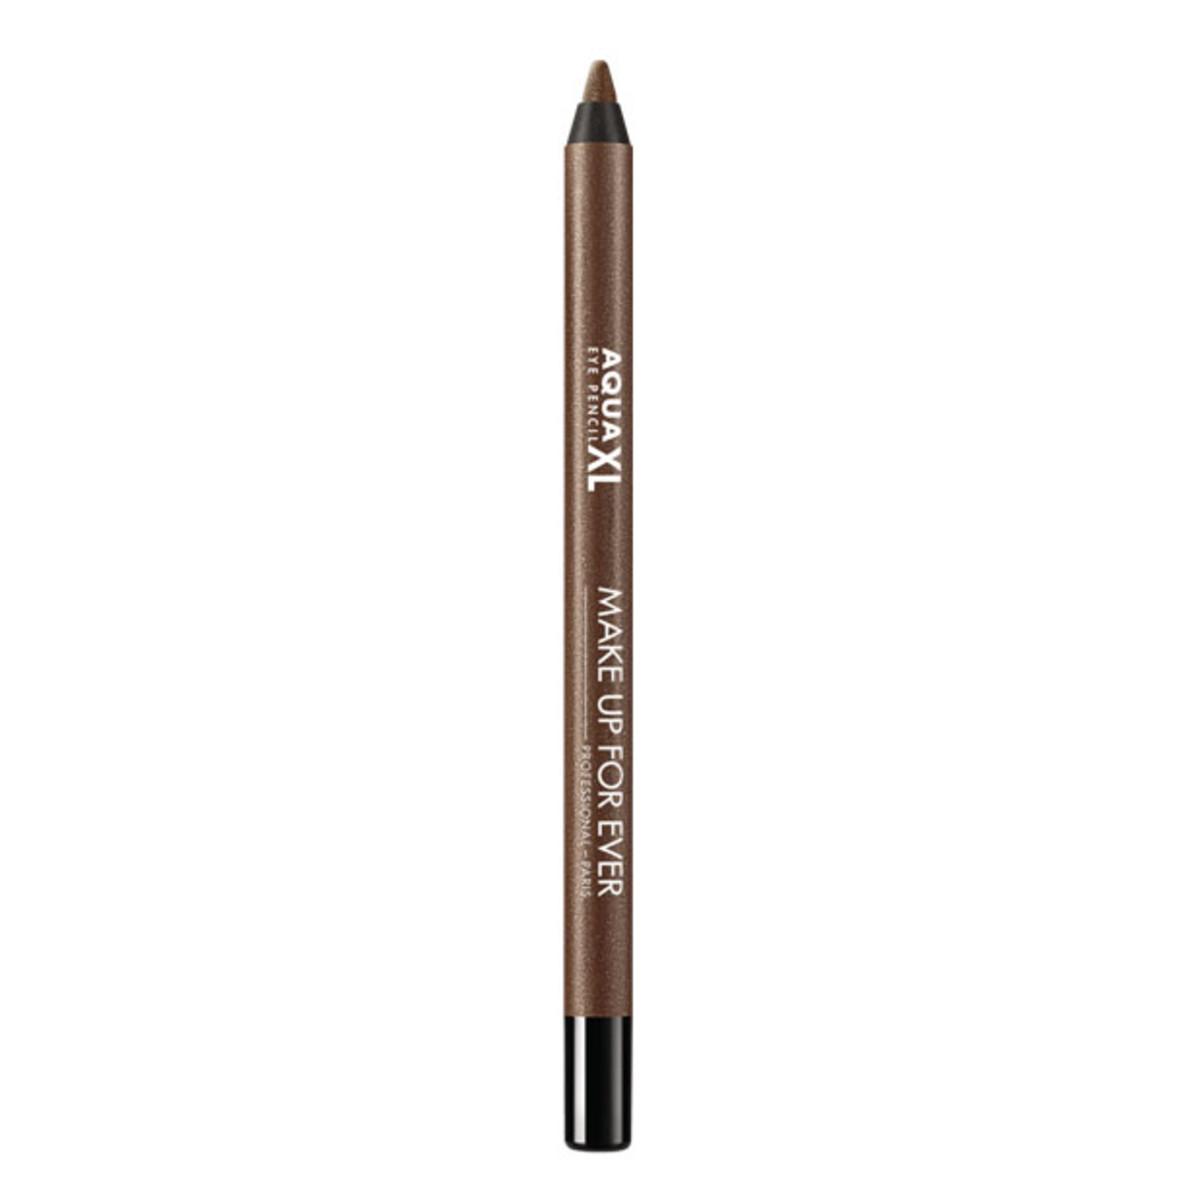 Make Up For Ever Aqua XL Eye Pencil Waterproof Eyeliner in Aqua XL D-62